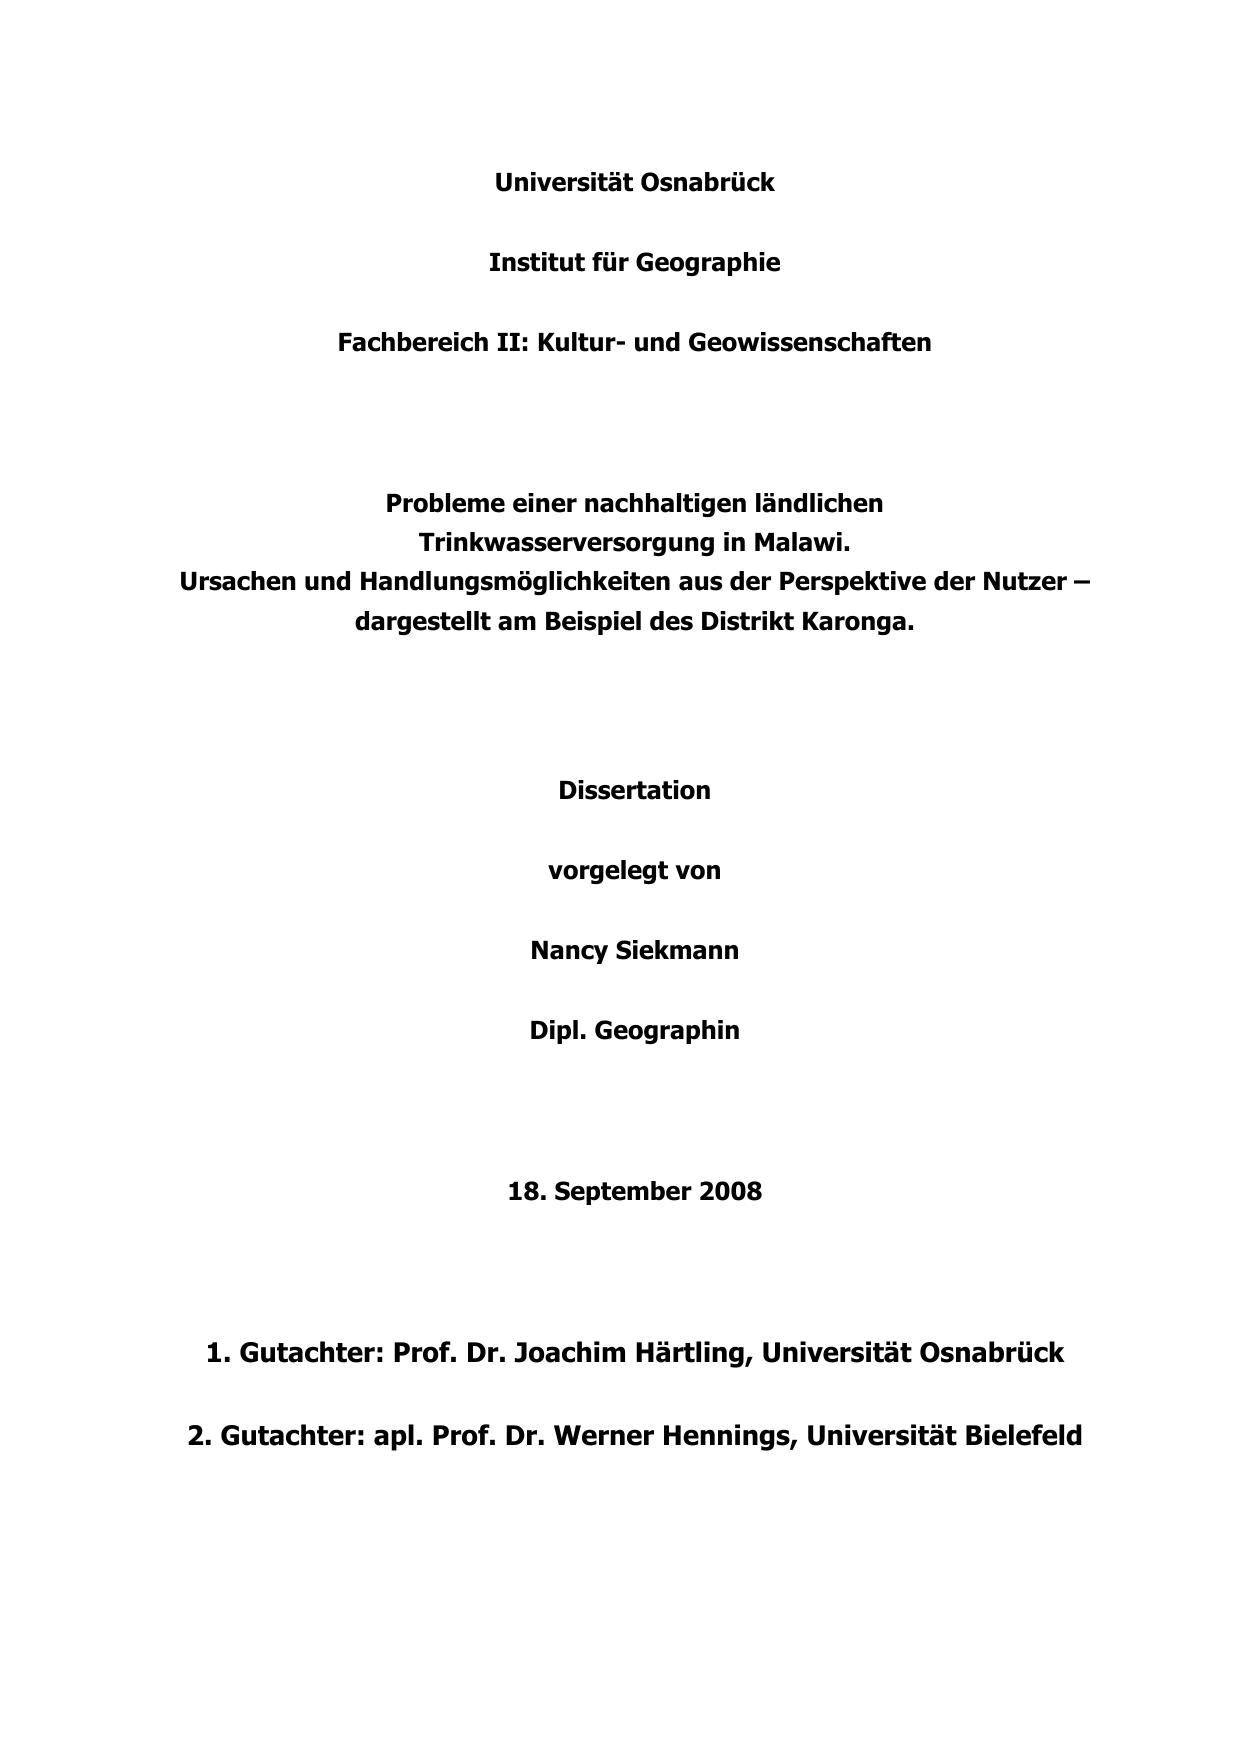 Endfassung Dekanat - repOSitorium | manualzz.com